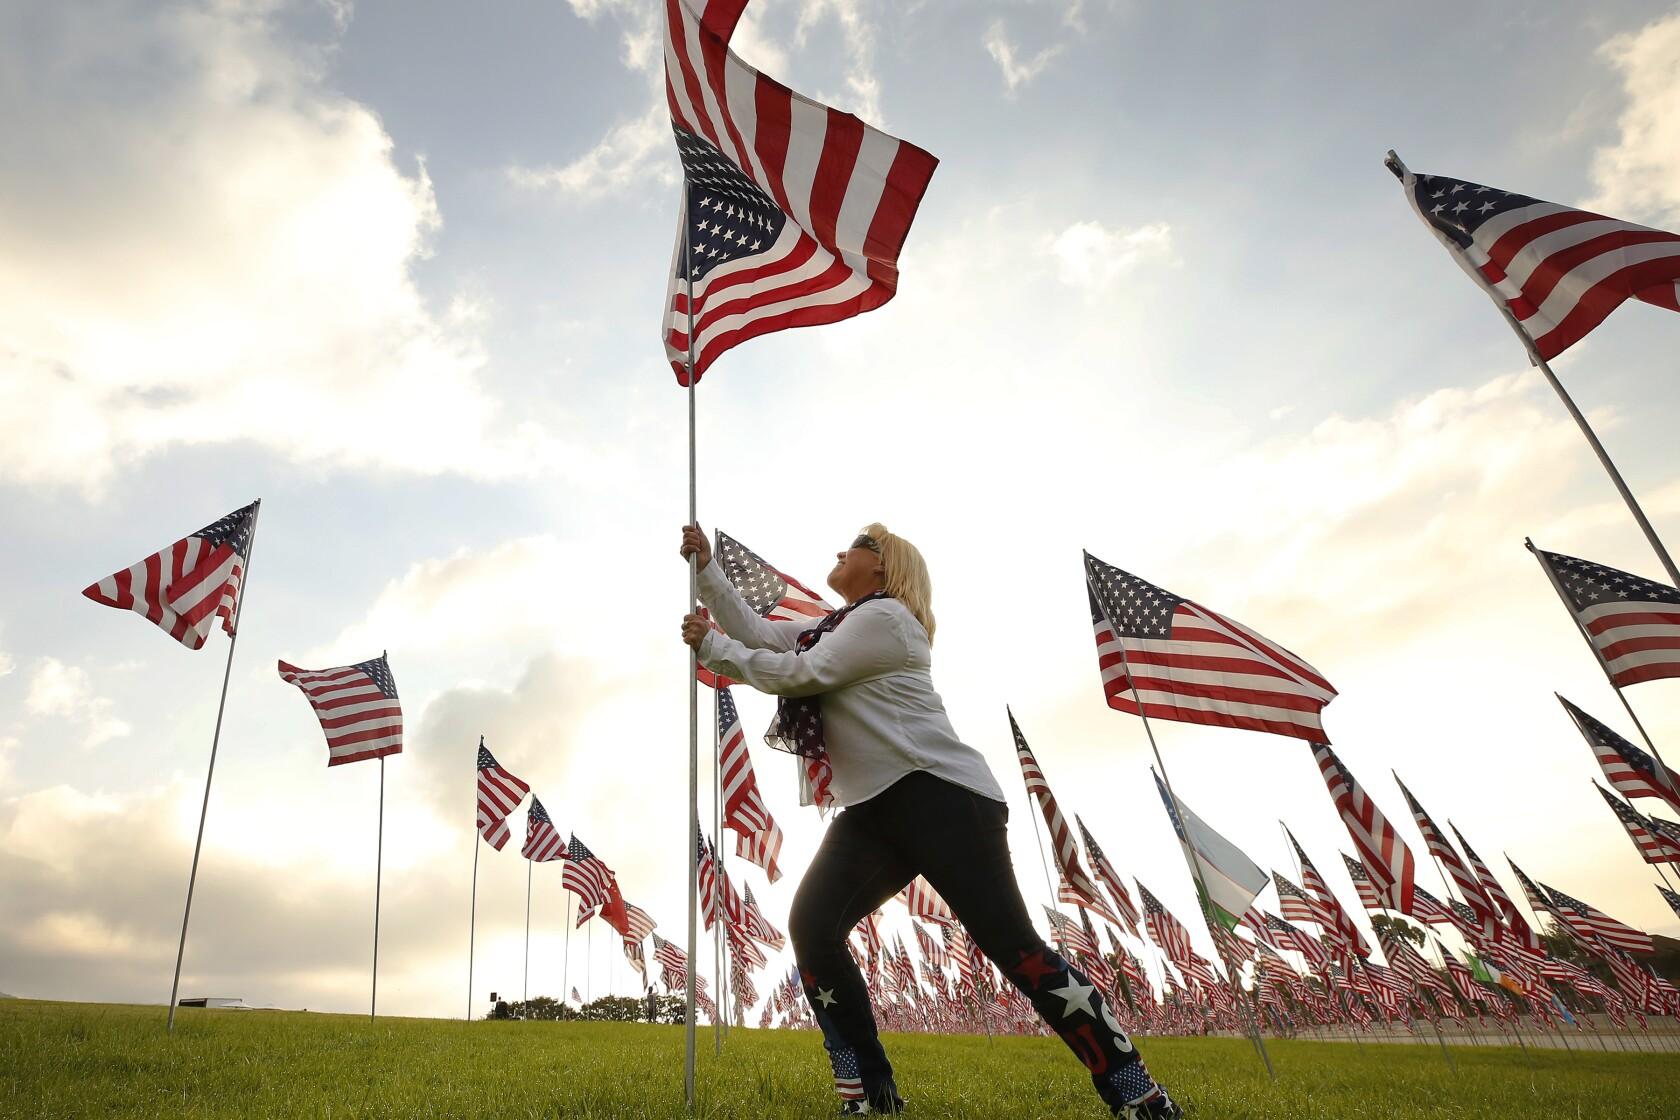 2001 FIREMAN RAISE USA FLAG AT WORLD TRADE CENTER PHOTO NEW YORK CITY AMERICANA